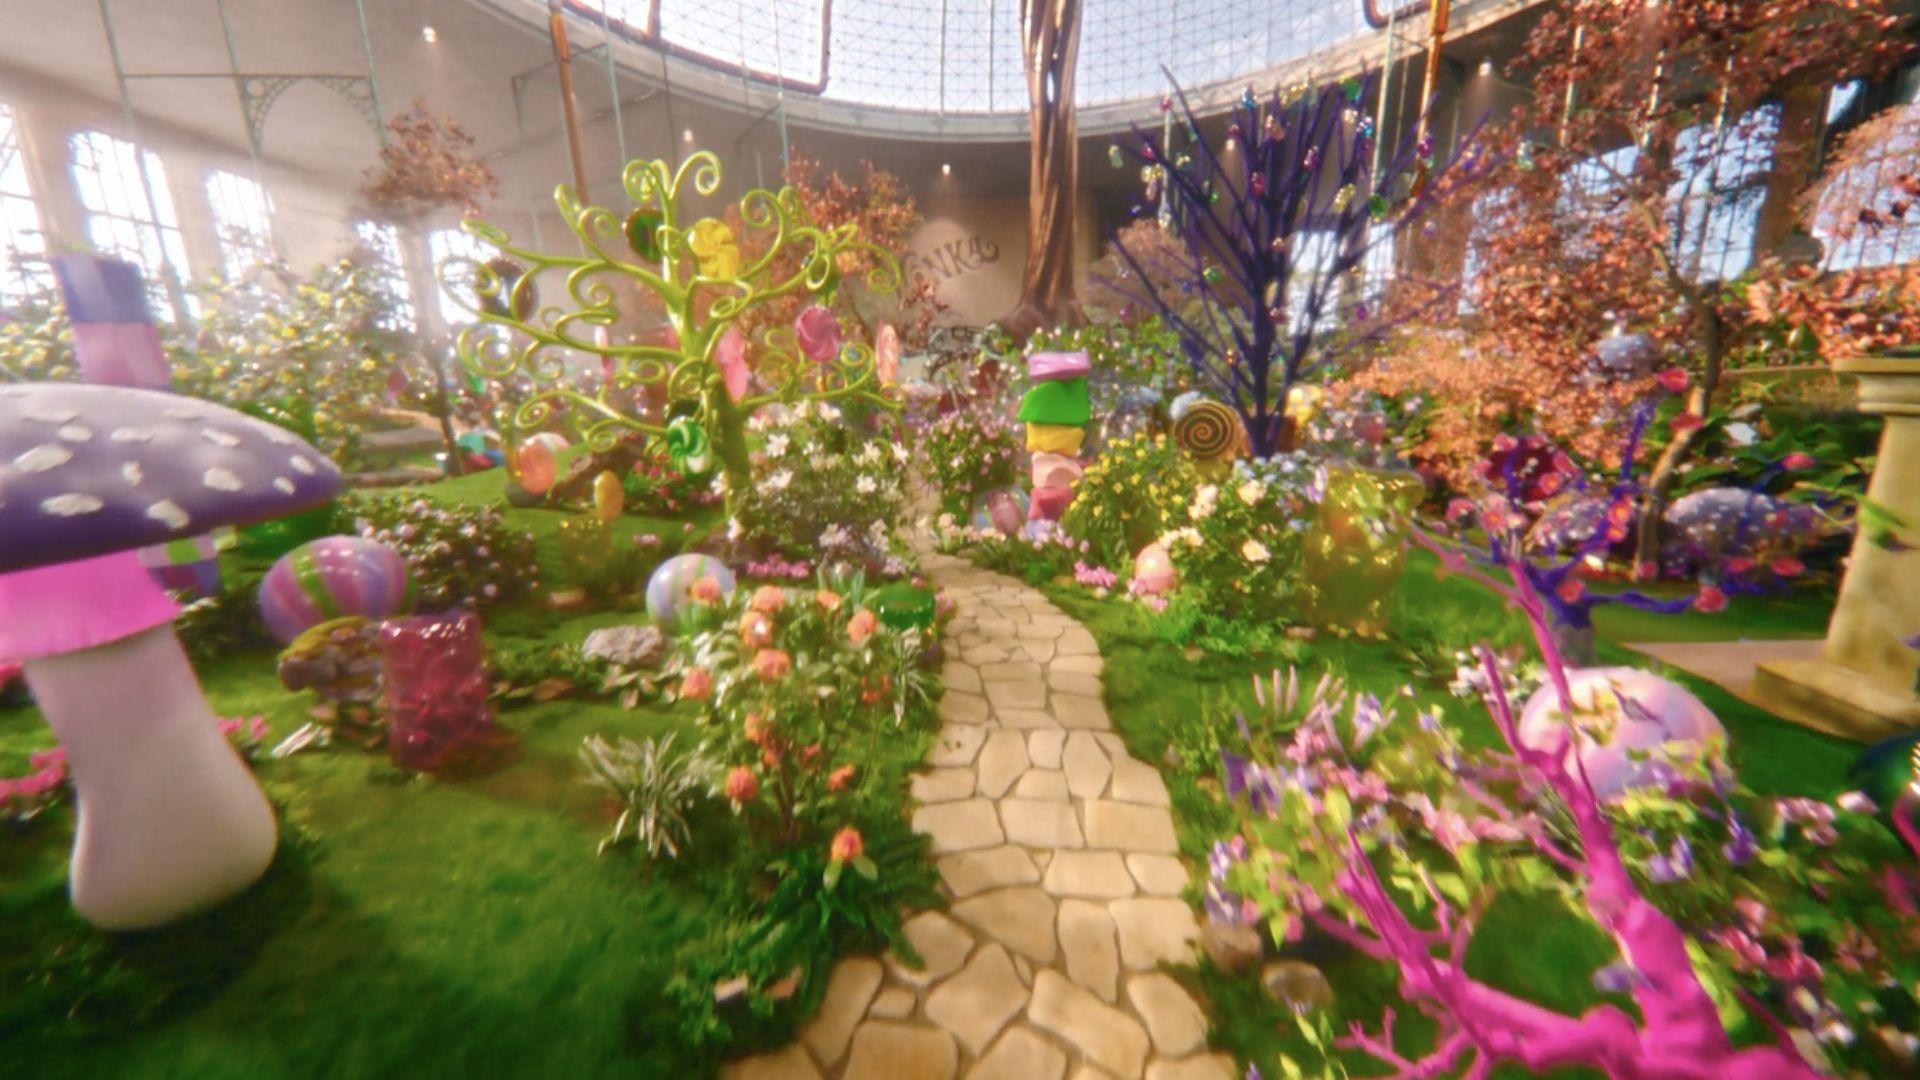 Wonka's Fantastical Factory